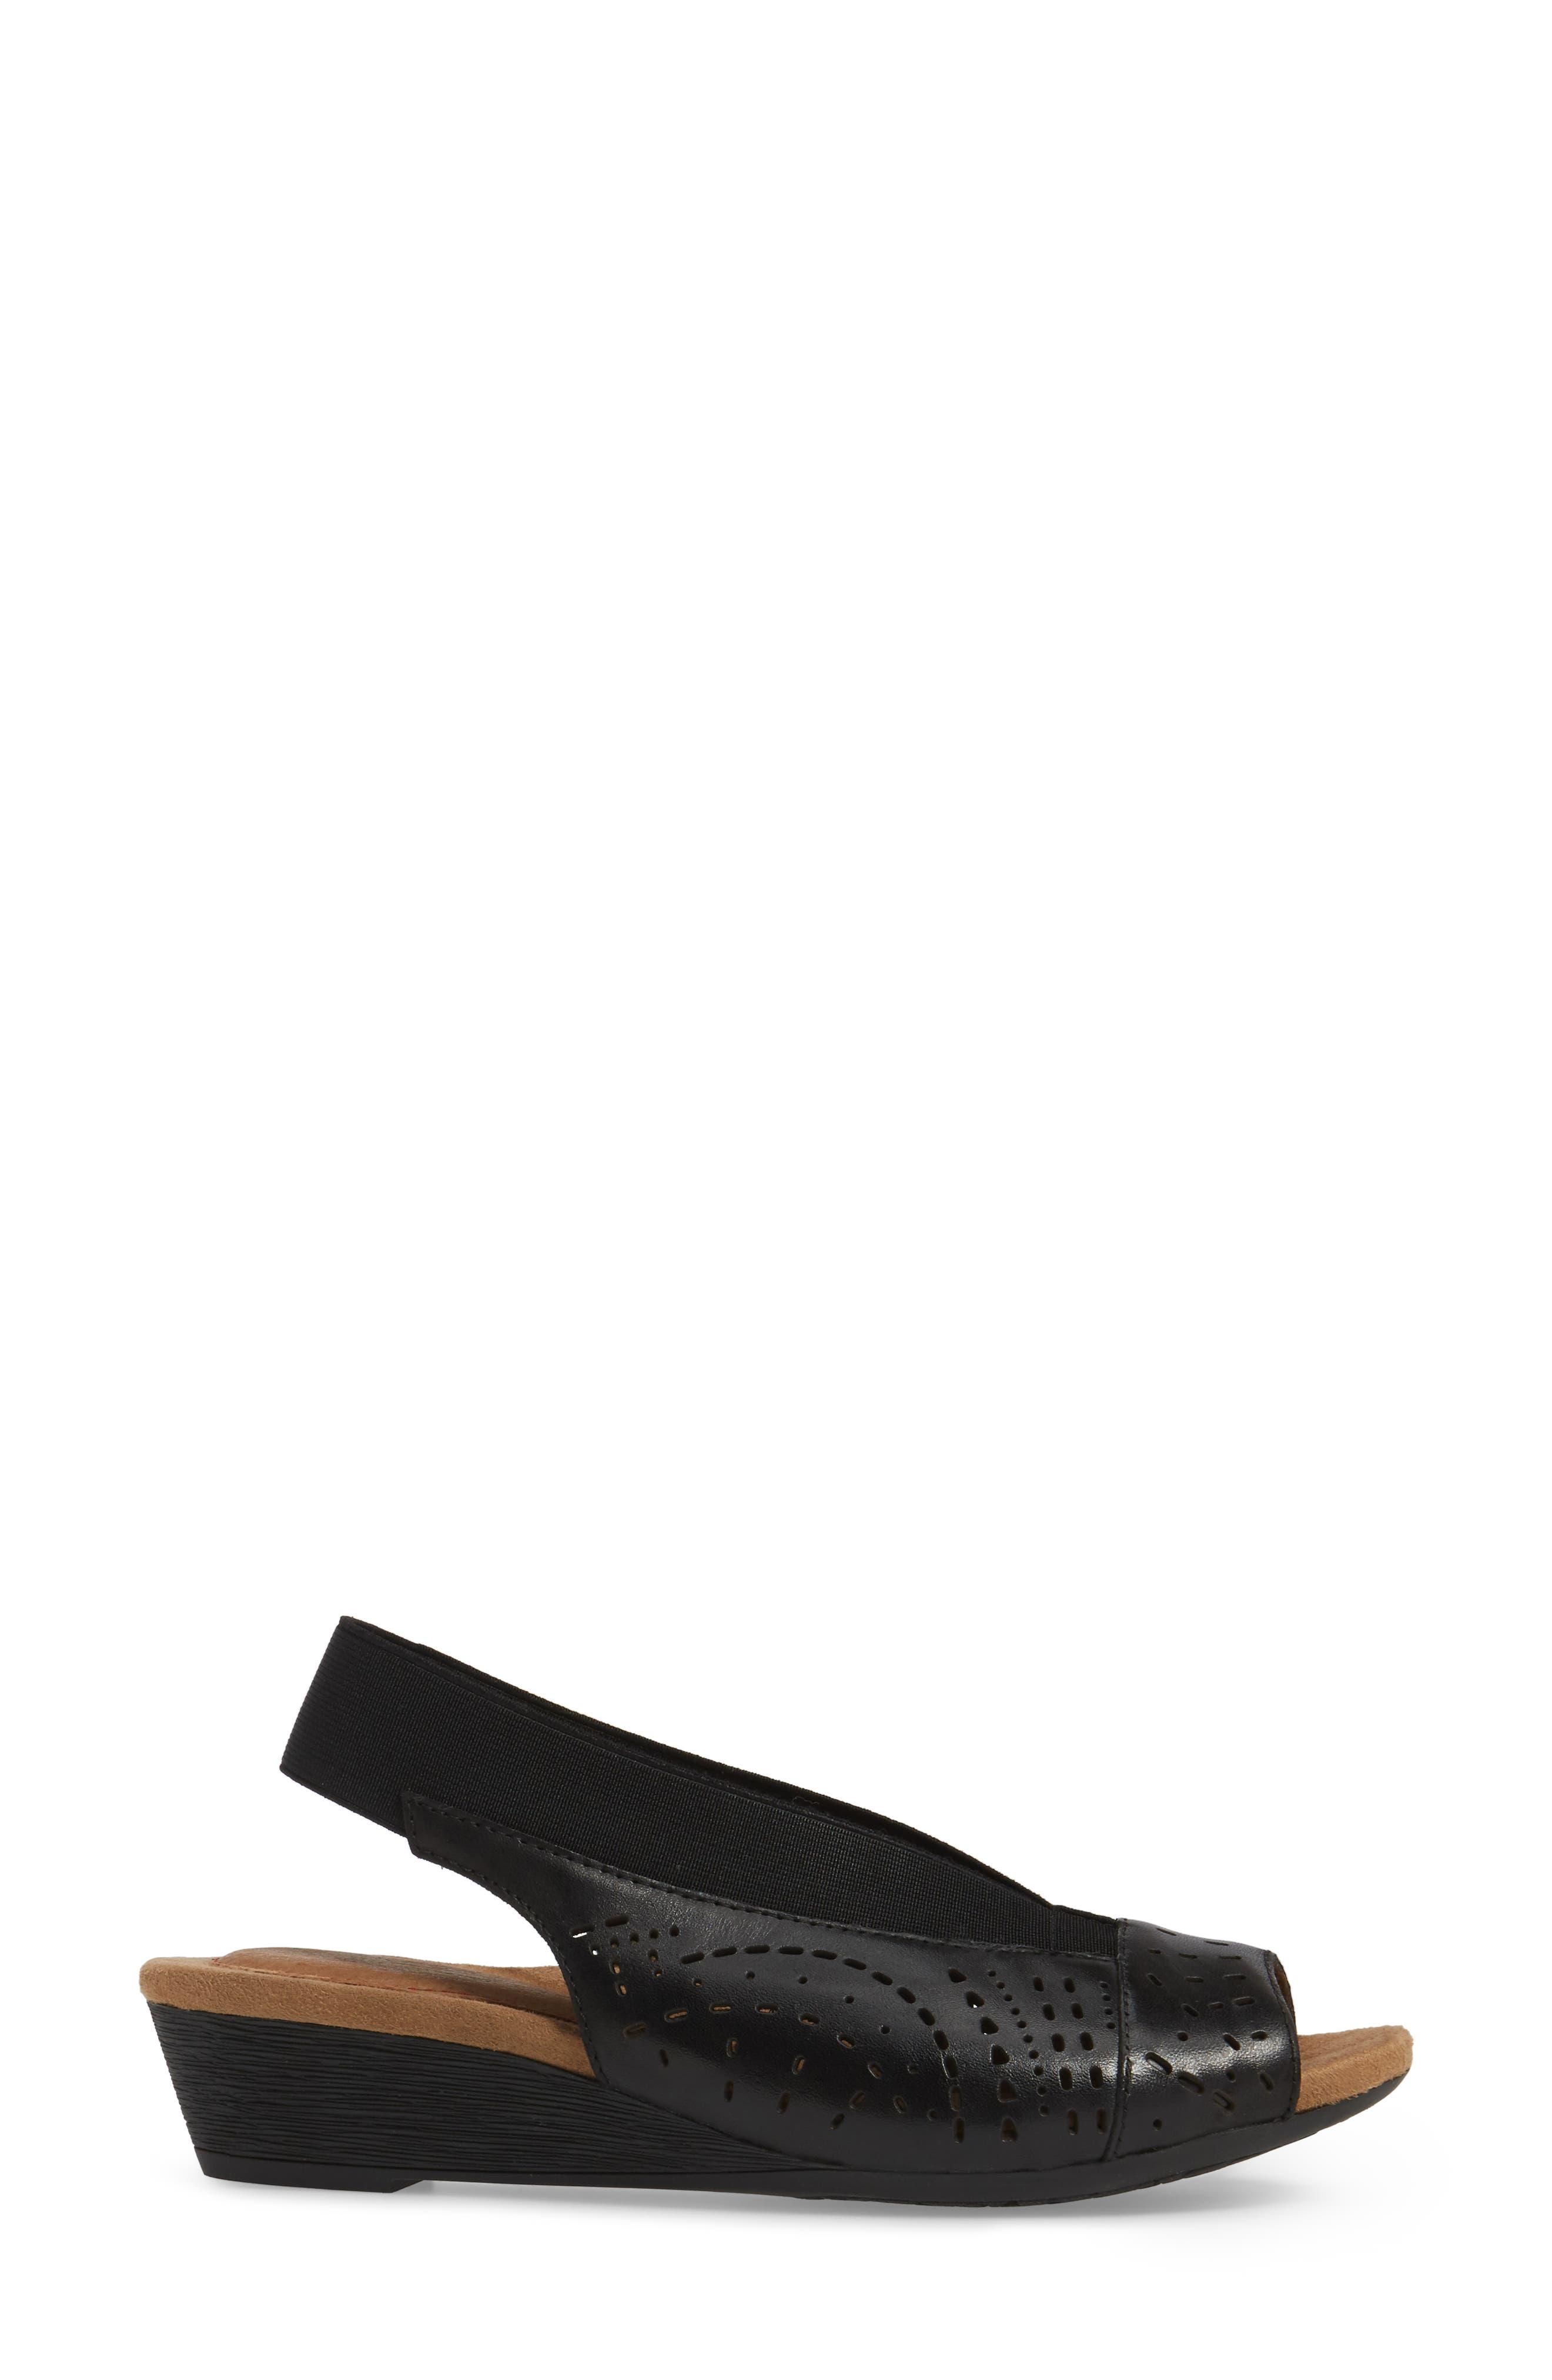 Judson Slingback Wedge Sandal,                             Alternate thumbnail 3, color,                             BLACK LEATHER